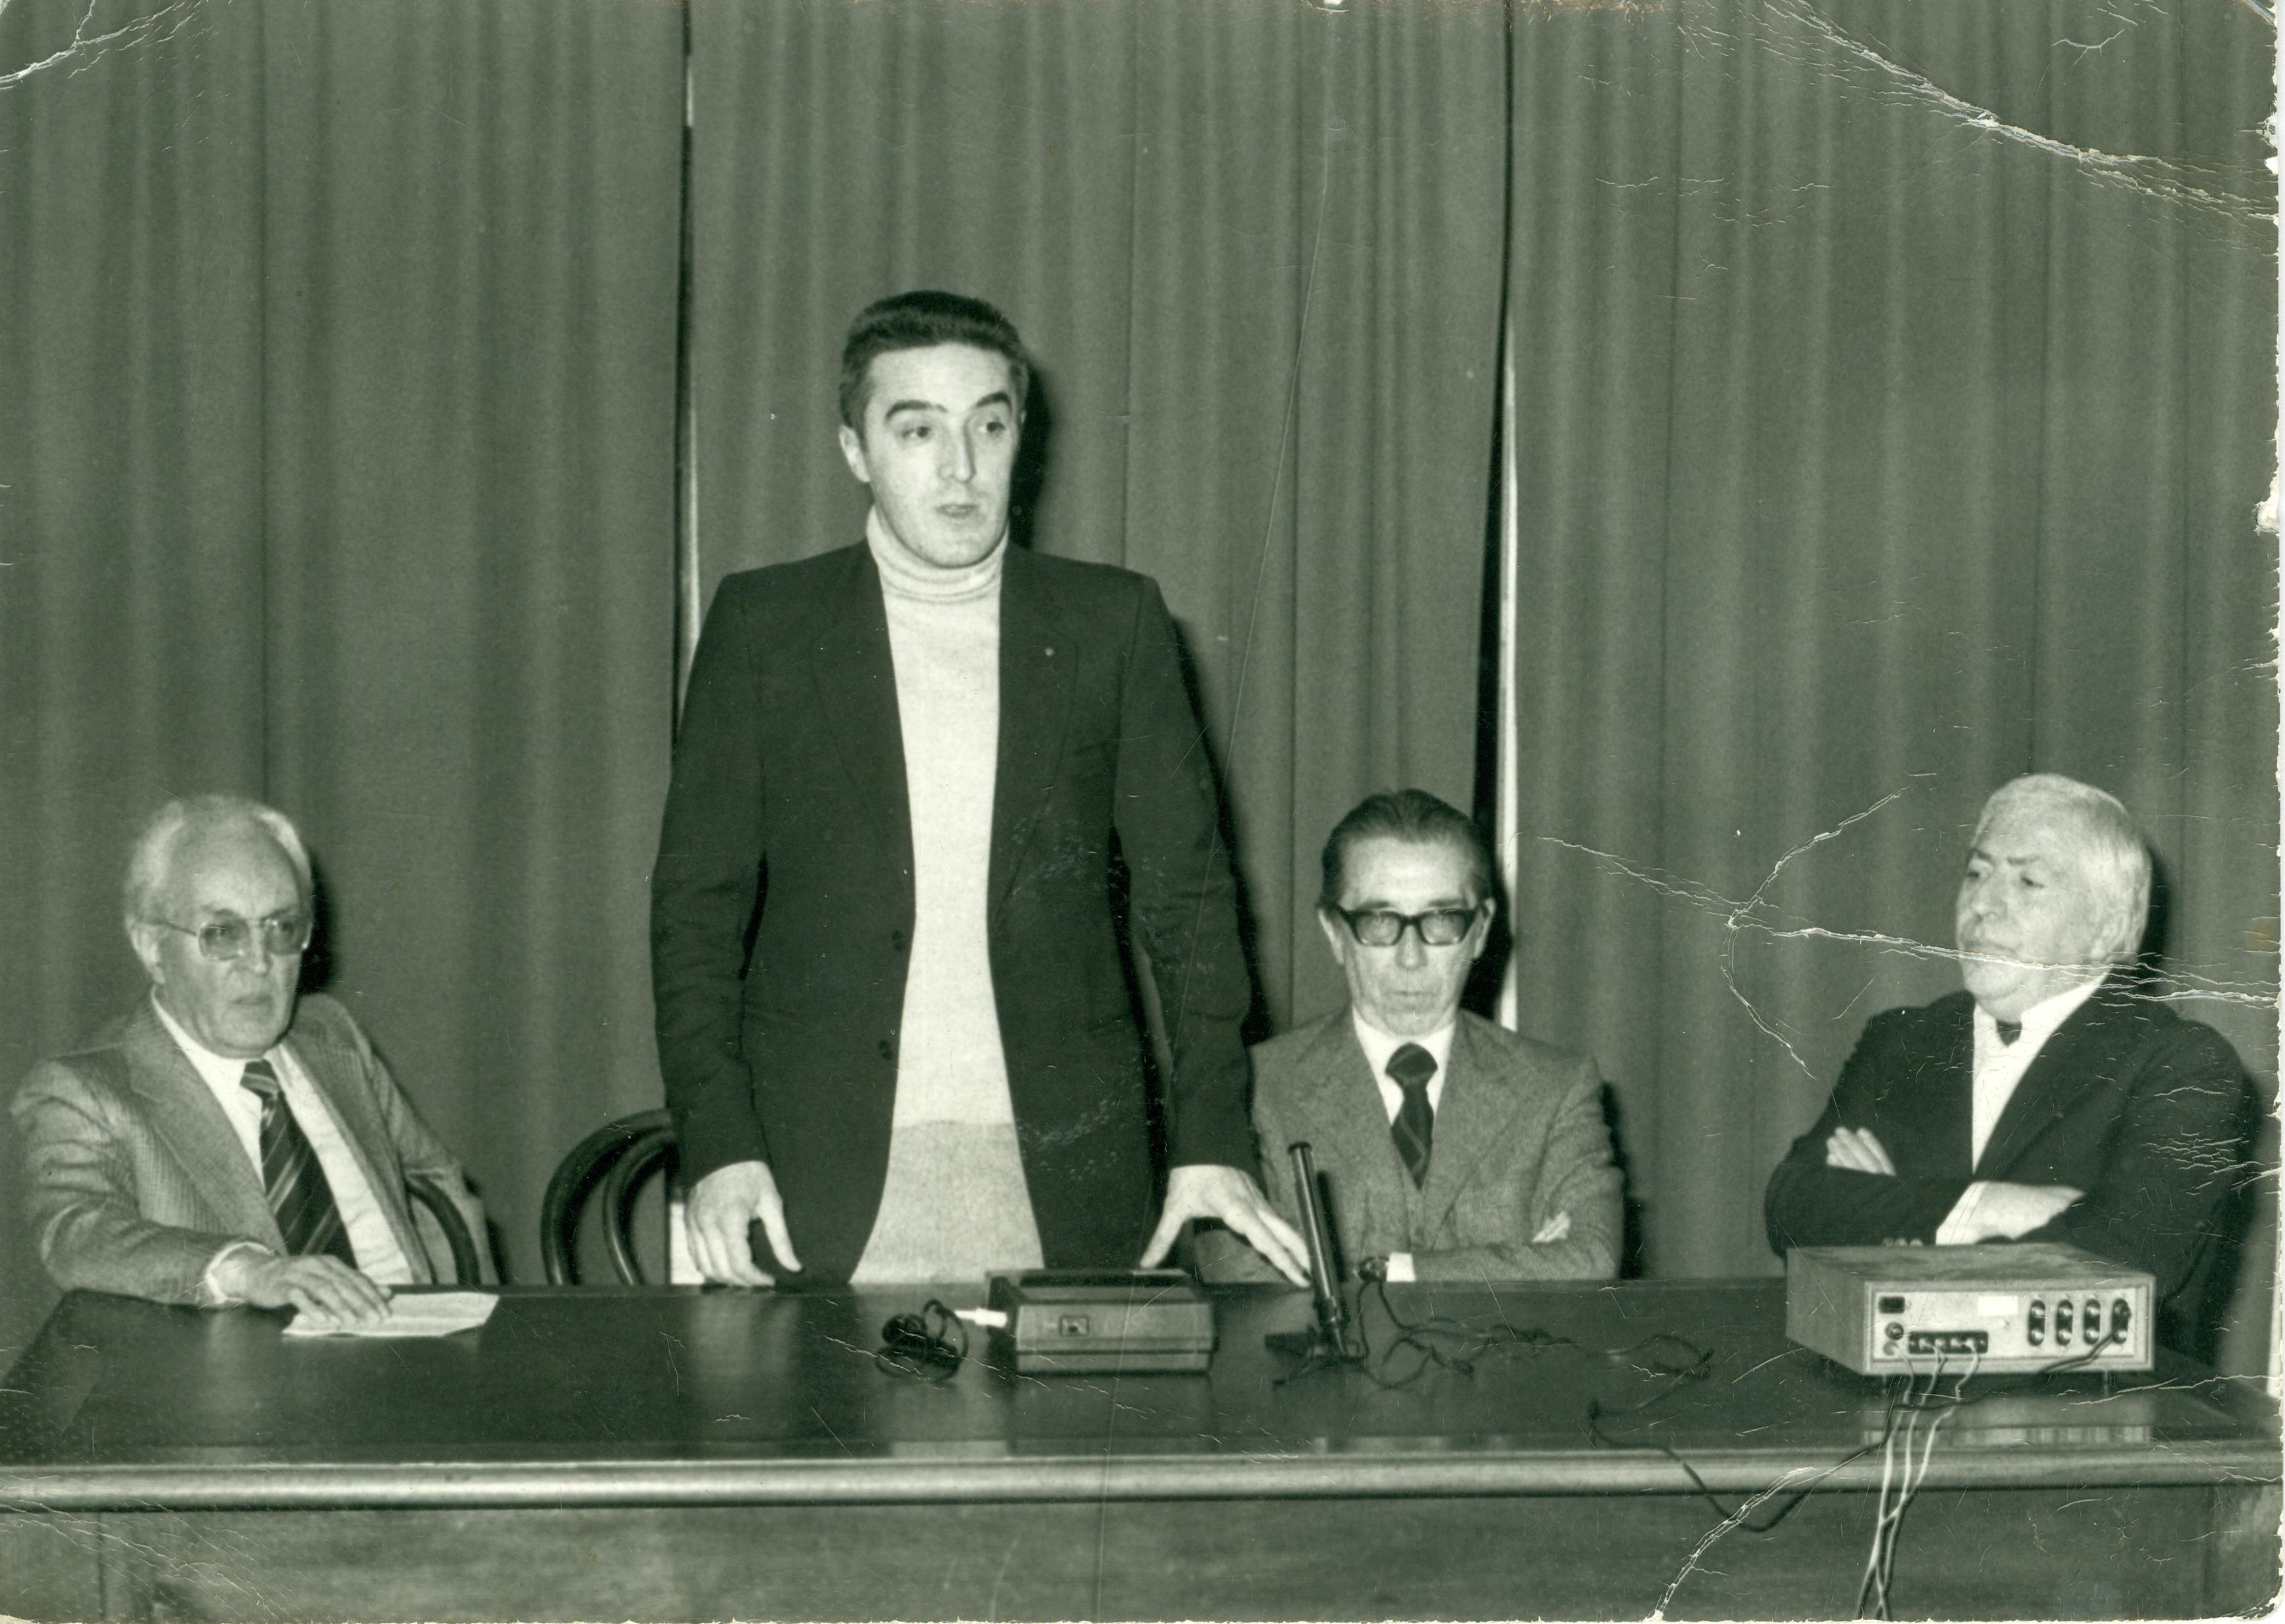 1974 - Vittorio Tavernari con Piero Chiara, Silvano Colombo e Riccardo Malipiero